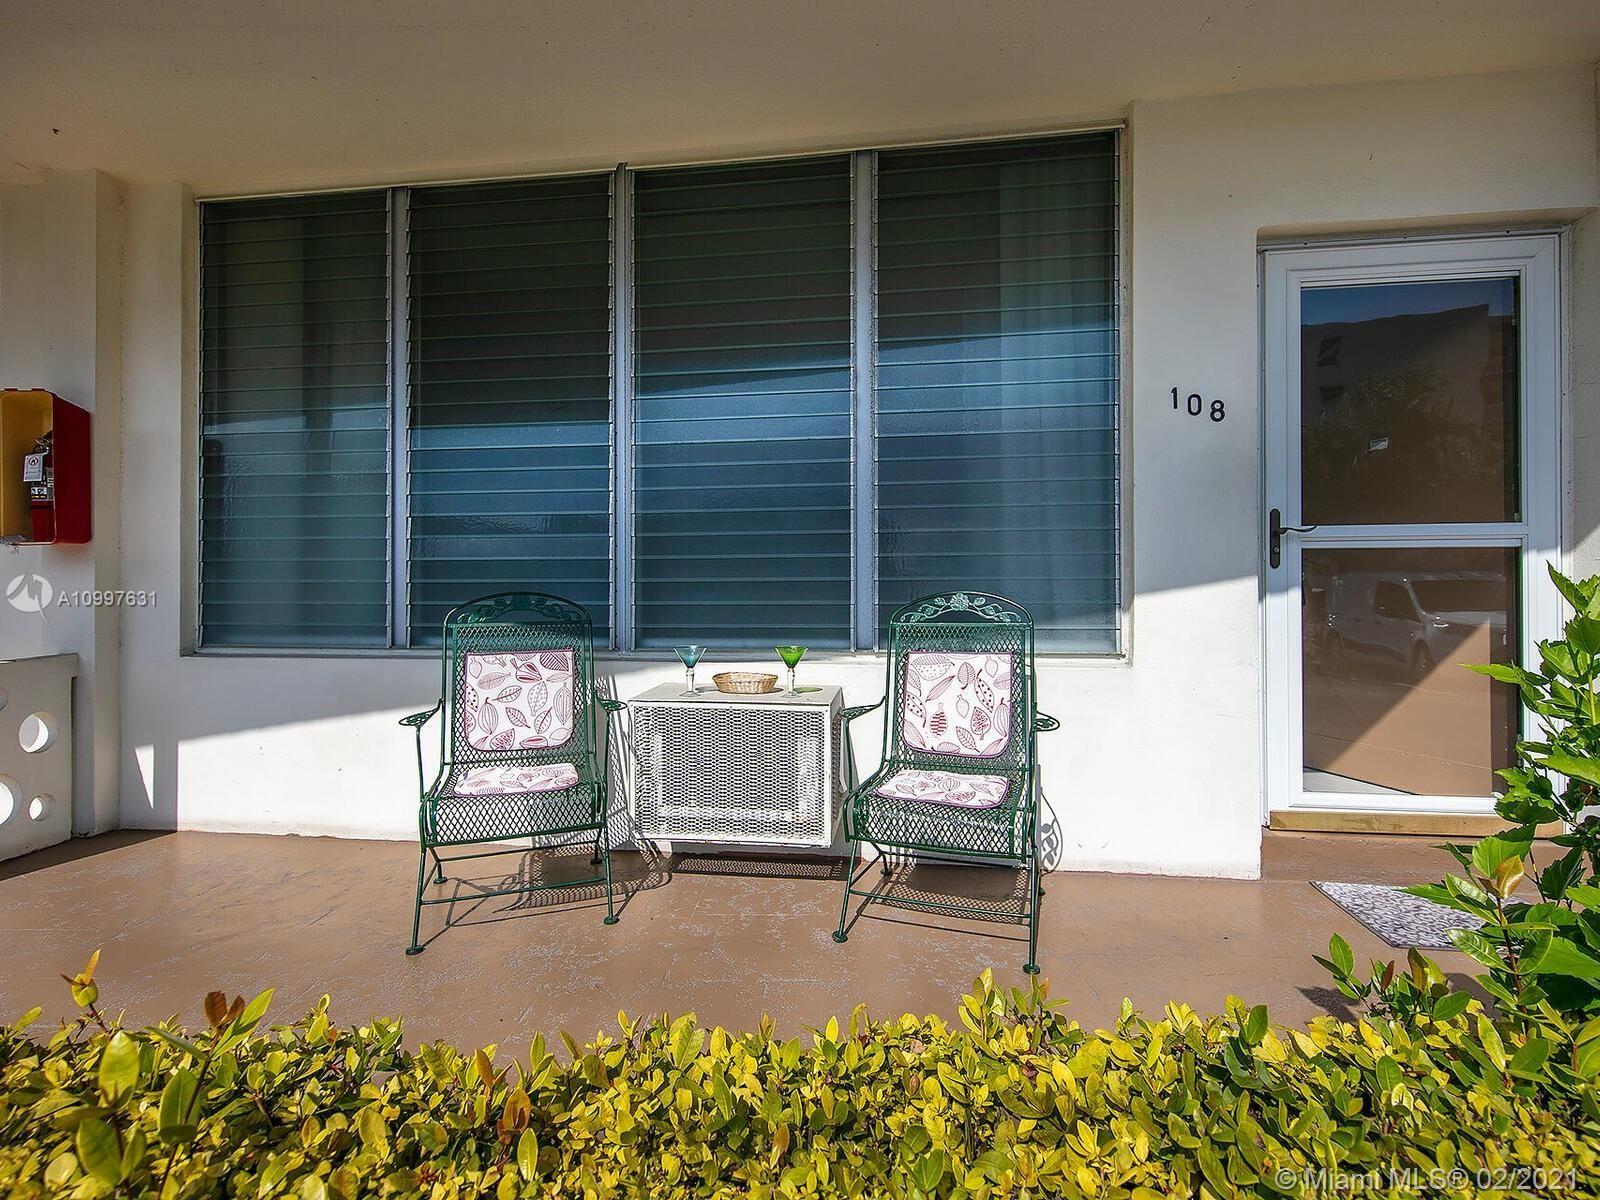 Photo of 3177 S Ocean Dr #108, Hallandale Beach, FL 33009 (MLS # A10997631)